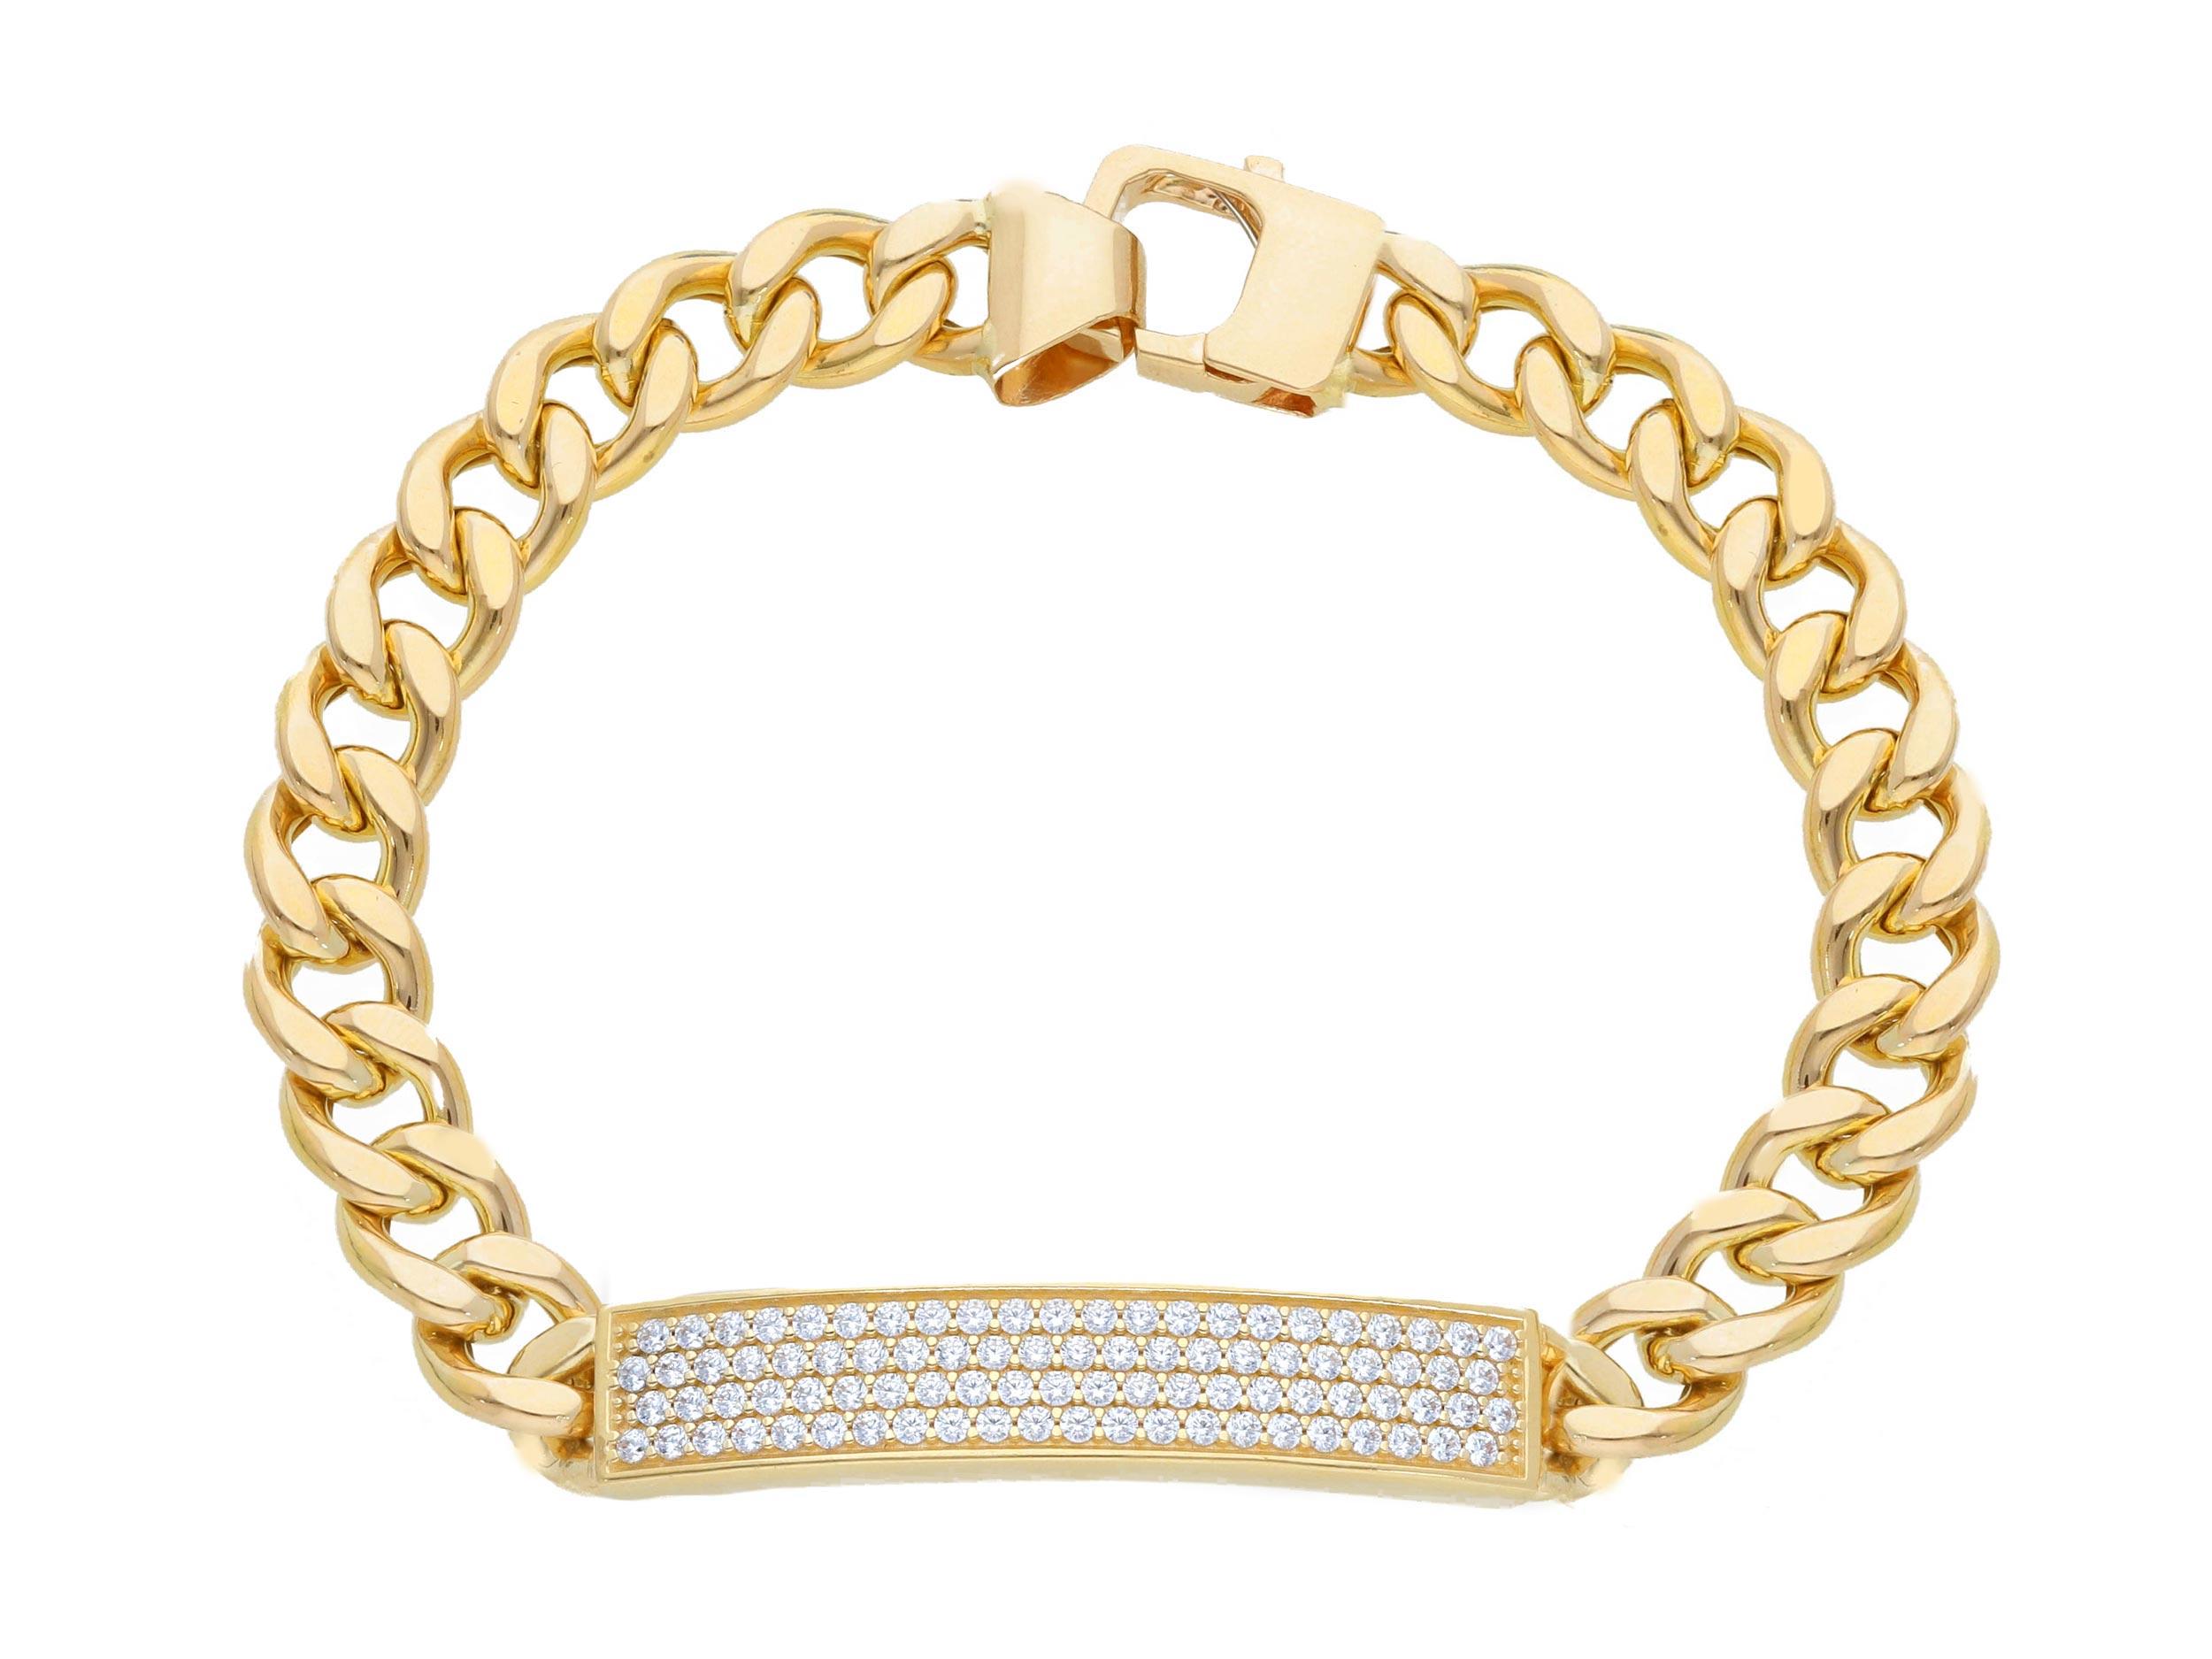 Stylish 18ct Yellow Gold Bracelet 21cm with cubic Zirconia